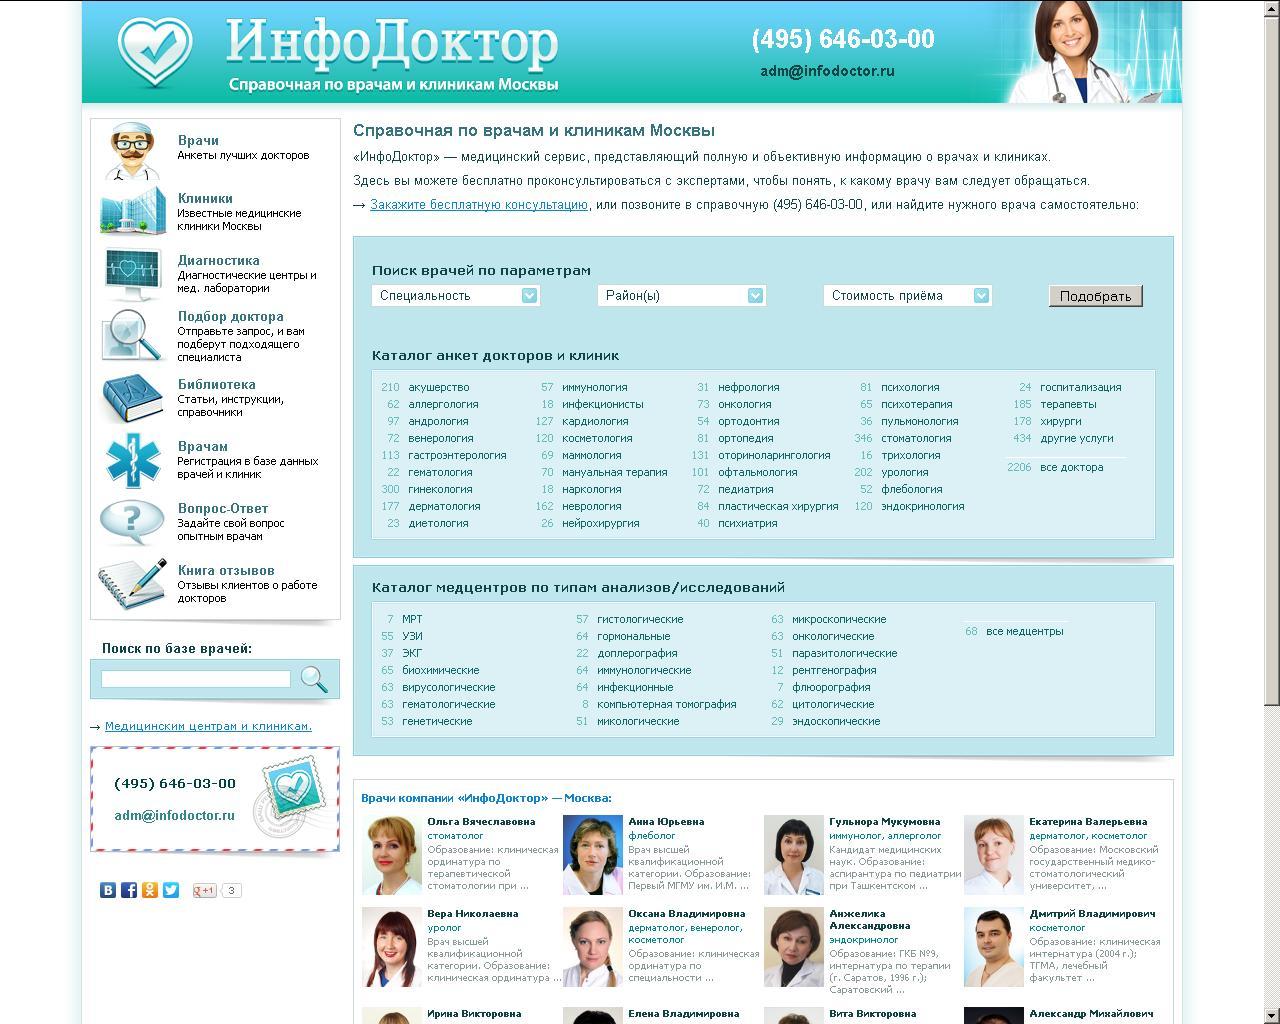 Infodoctor.ru